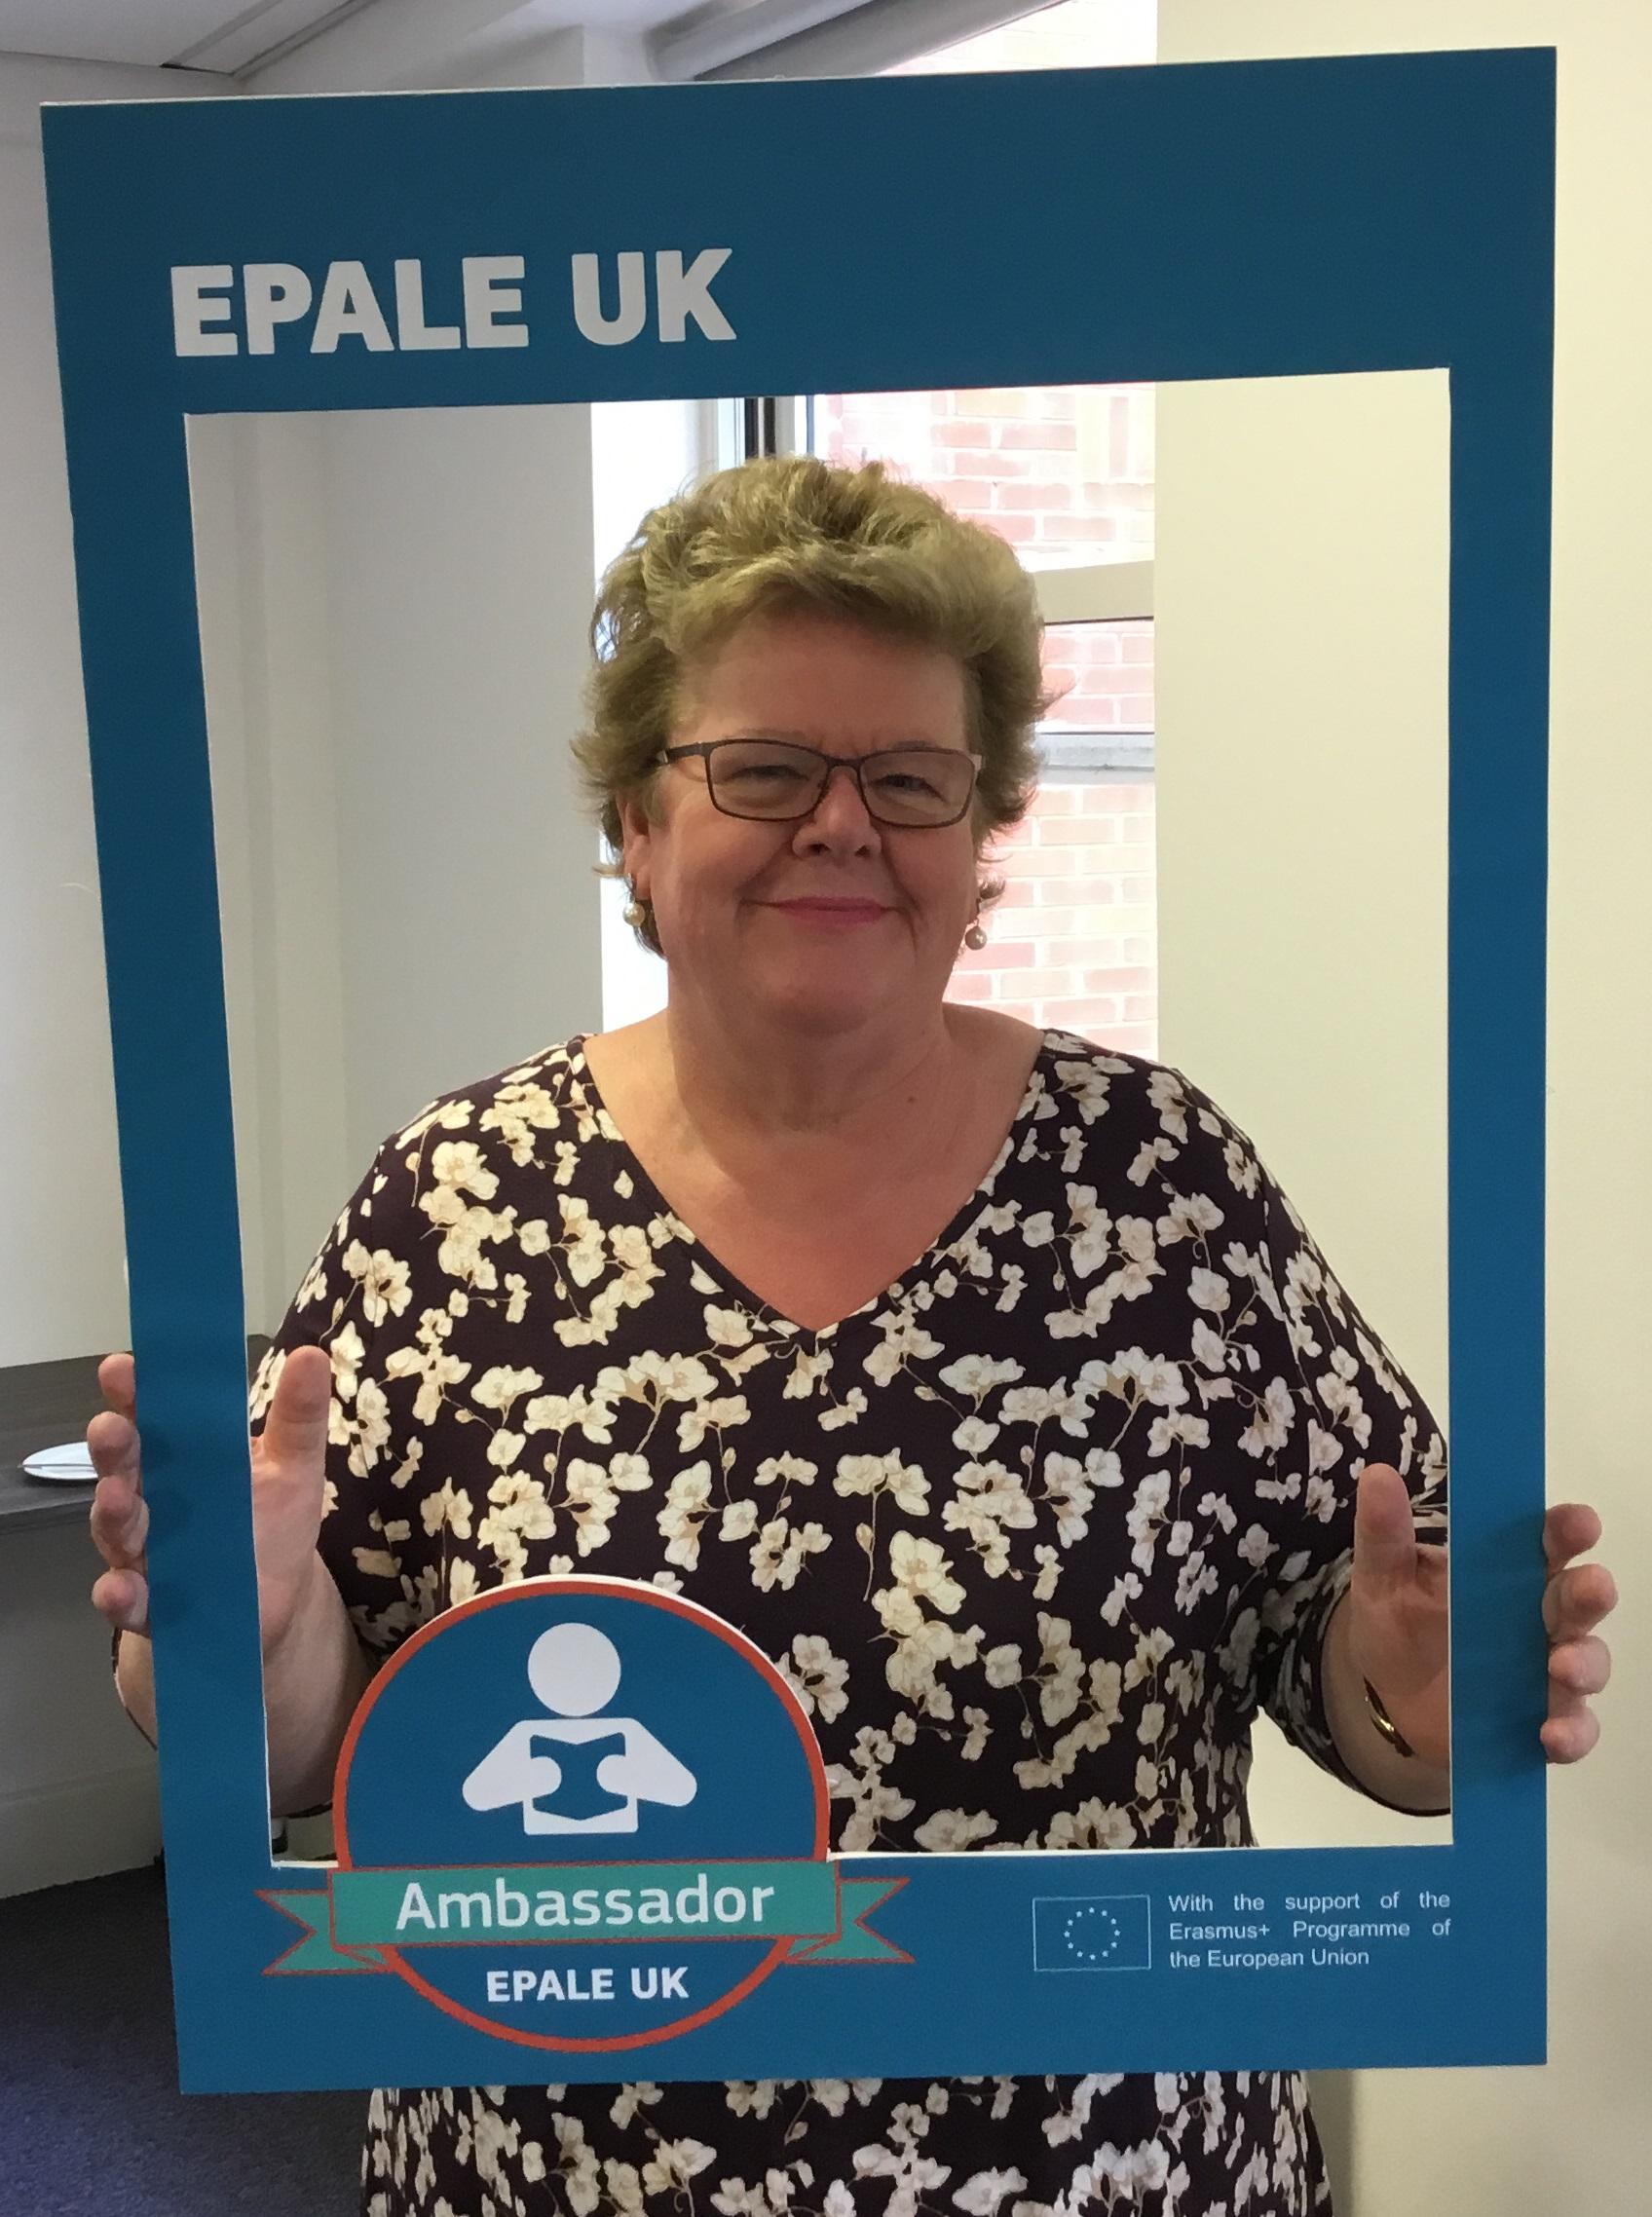 A photo of EPALE UK Ambassador Steph Taylor.